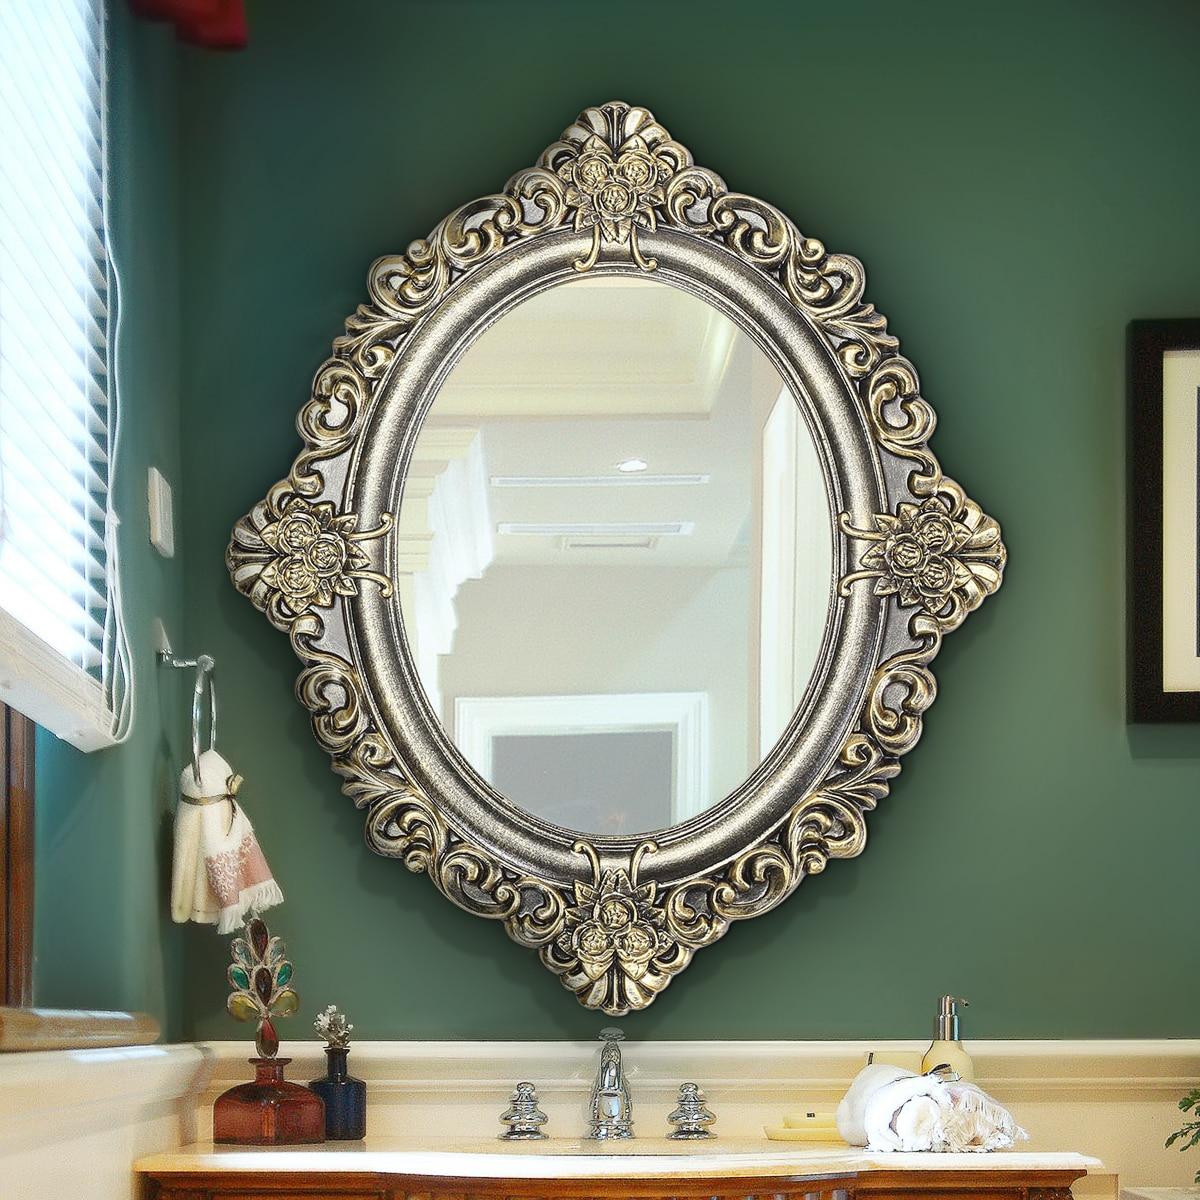 23 Inch Oval Decorative Mirrors Retro Vintage Wall Mouted ... on Wall Mirrors Decorative id=64121